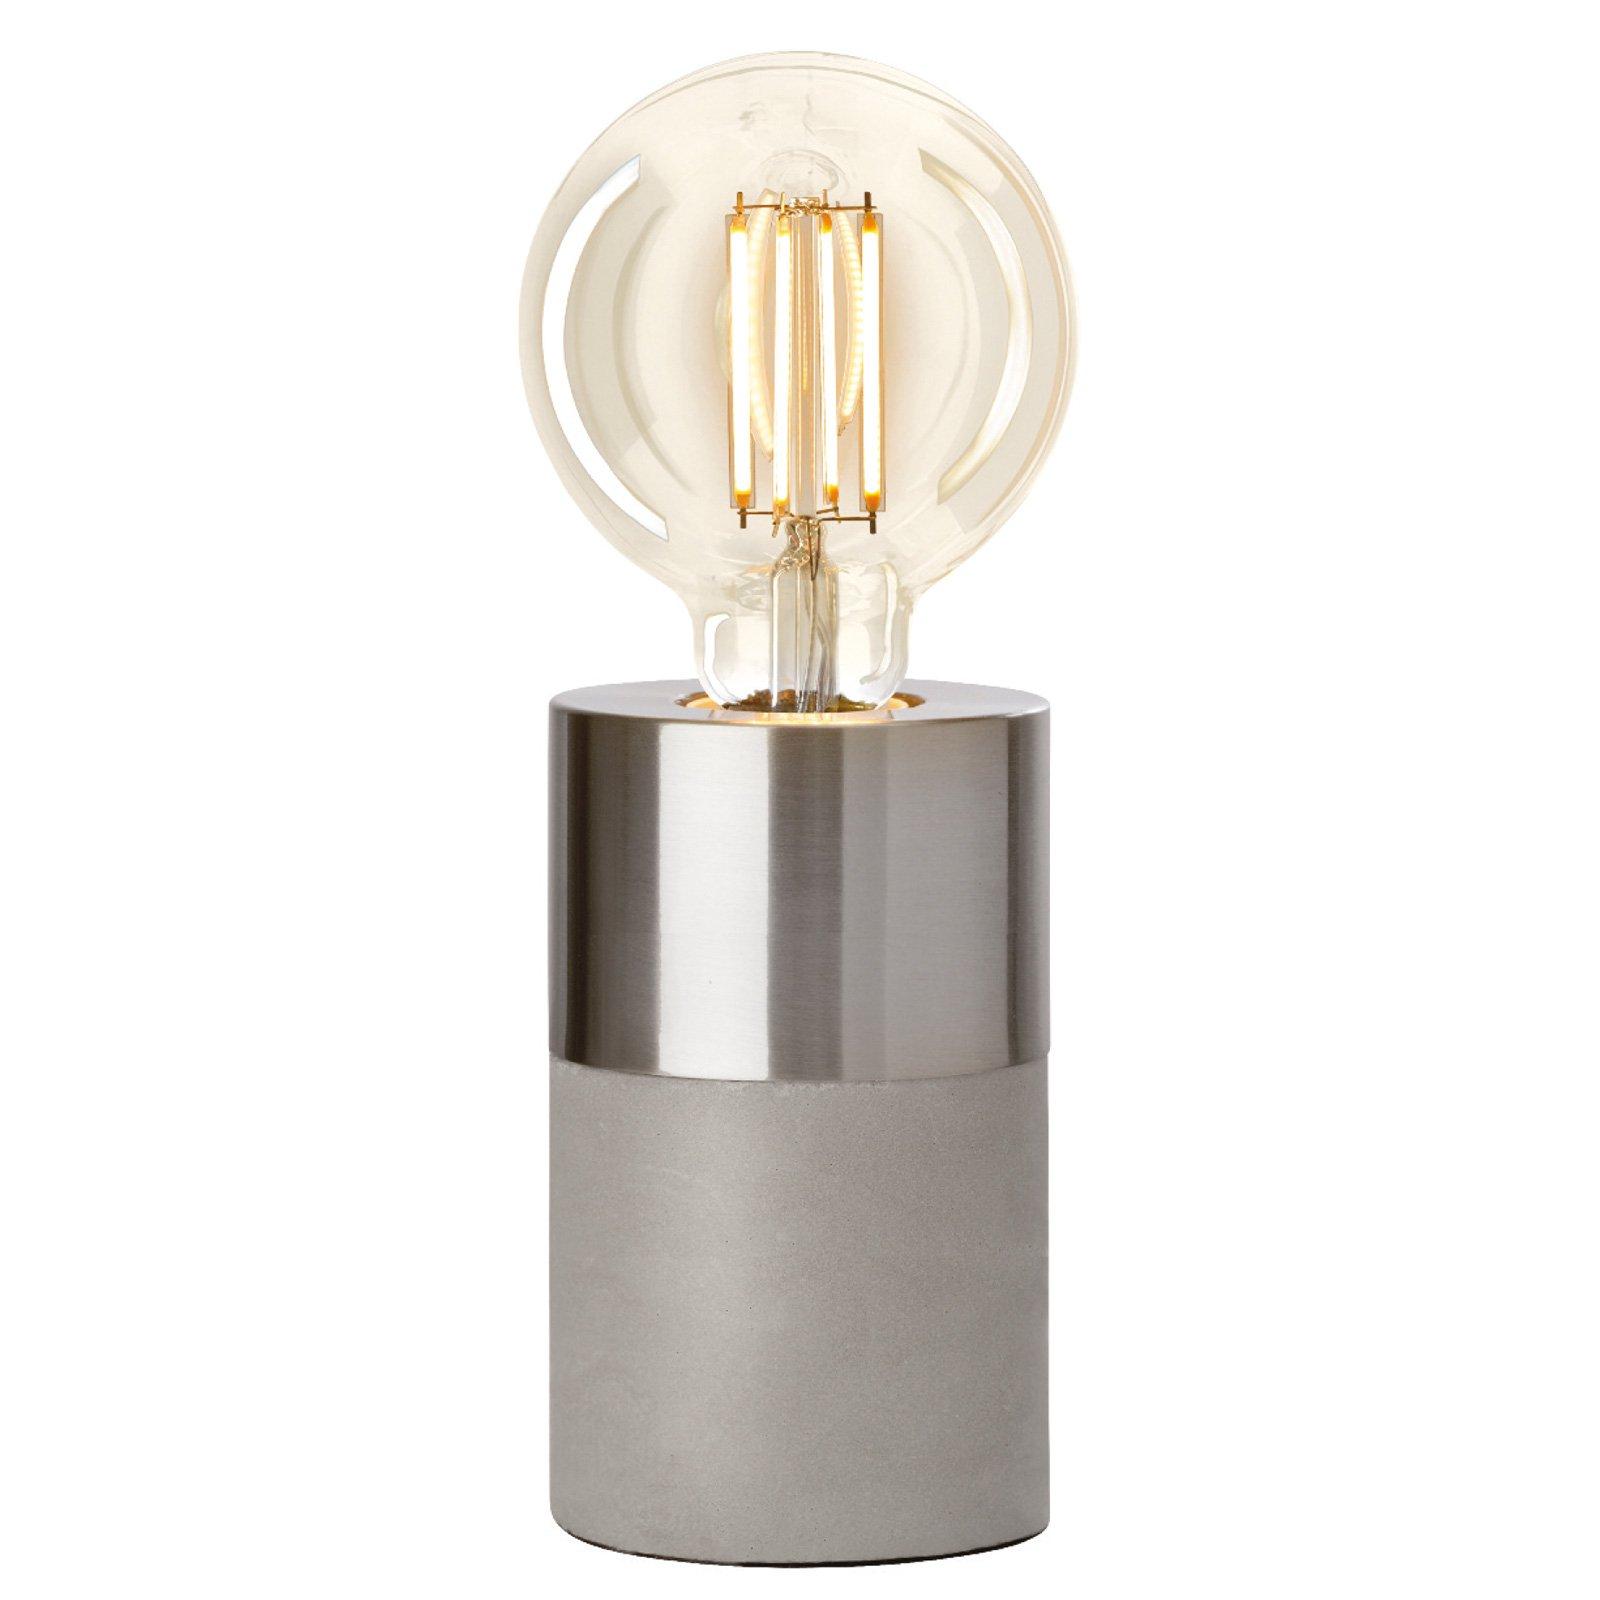 Villeroy & Boch Athens bordlampe i kromoptikk